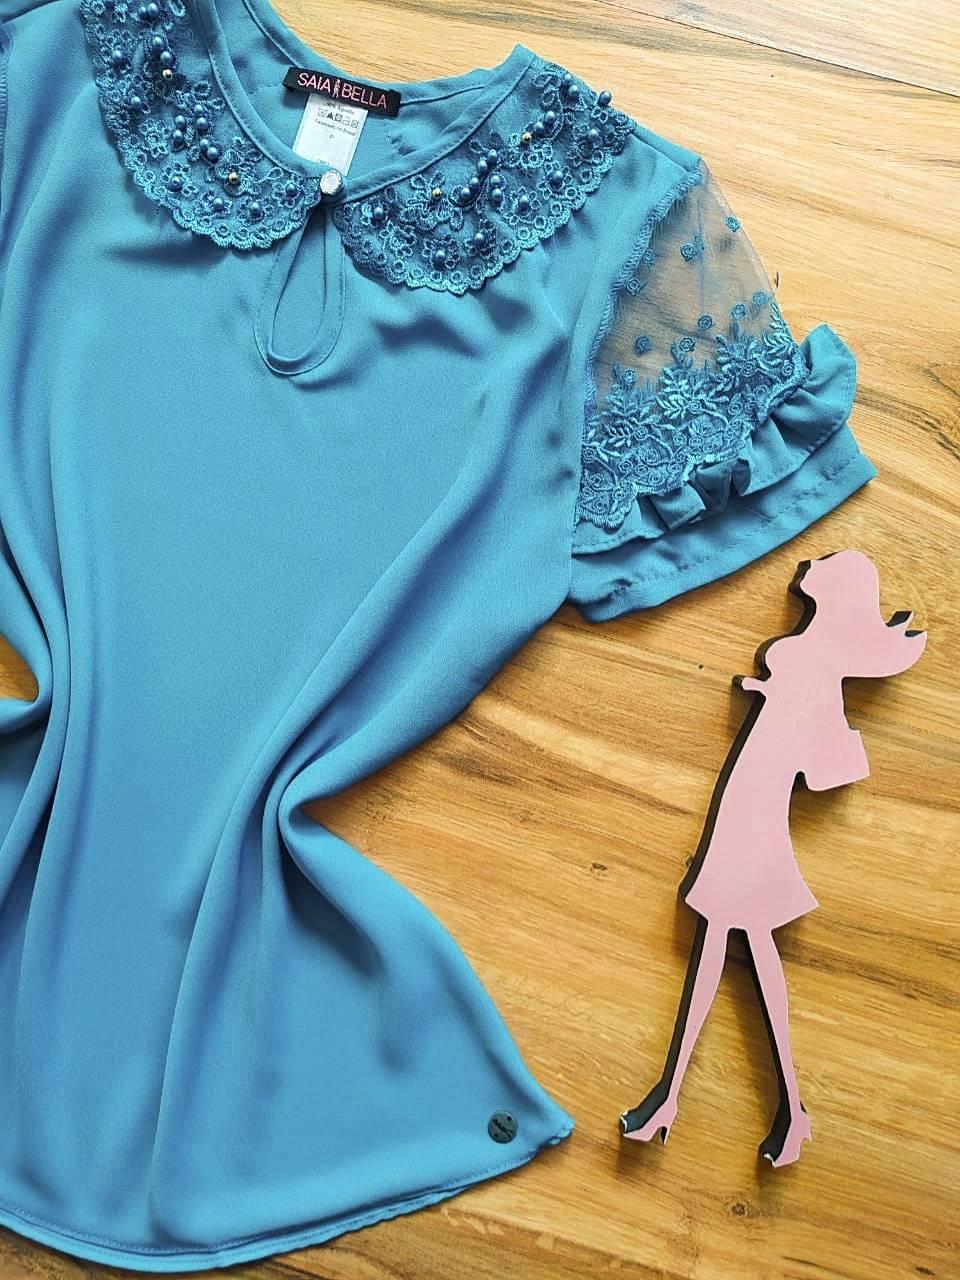 Blusa Nádia Saia Bella - SB700055 - Azul Caribe